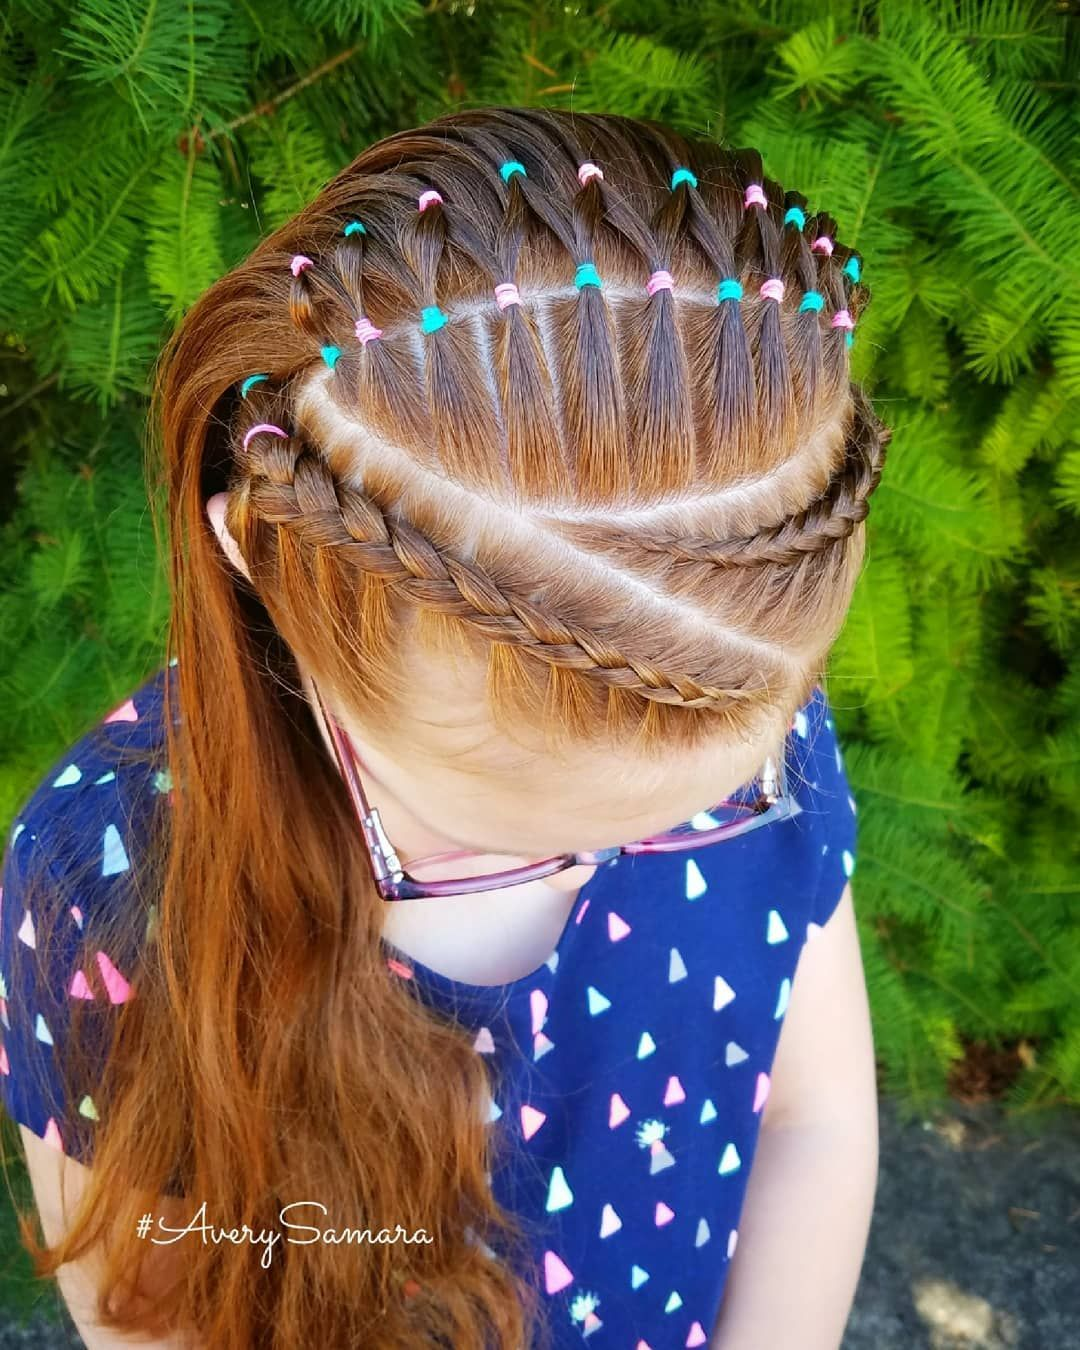 Dutch Braids Elastic Braid Styles Braid Combos Kids Hairstyles Braids For Kids Ginger Trenzas De Niñas Peinados Infantiles Peinados Con Trenzas Para Niñas